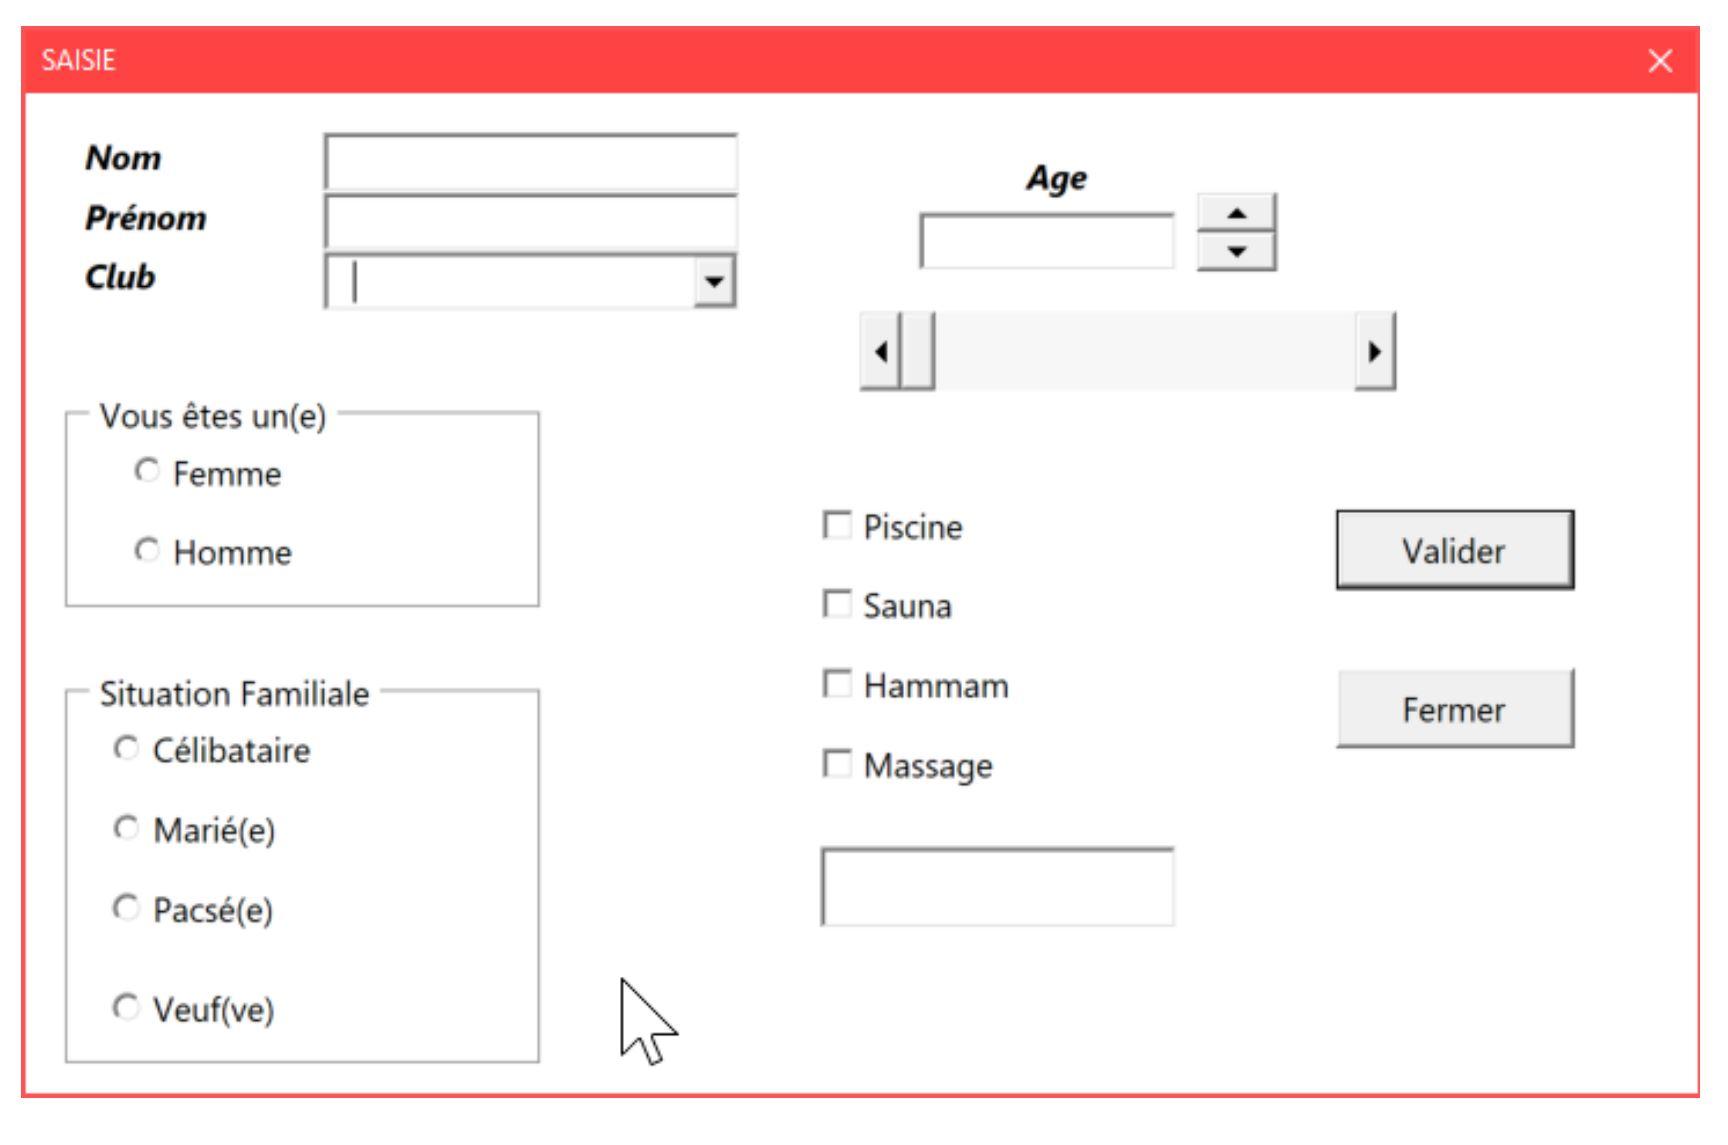 Créer un formulaire (userform) en programmation VBA dans Excel